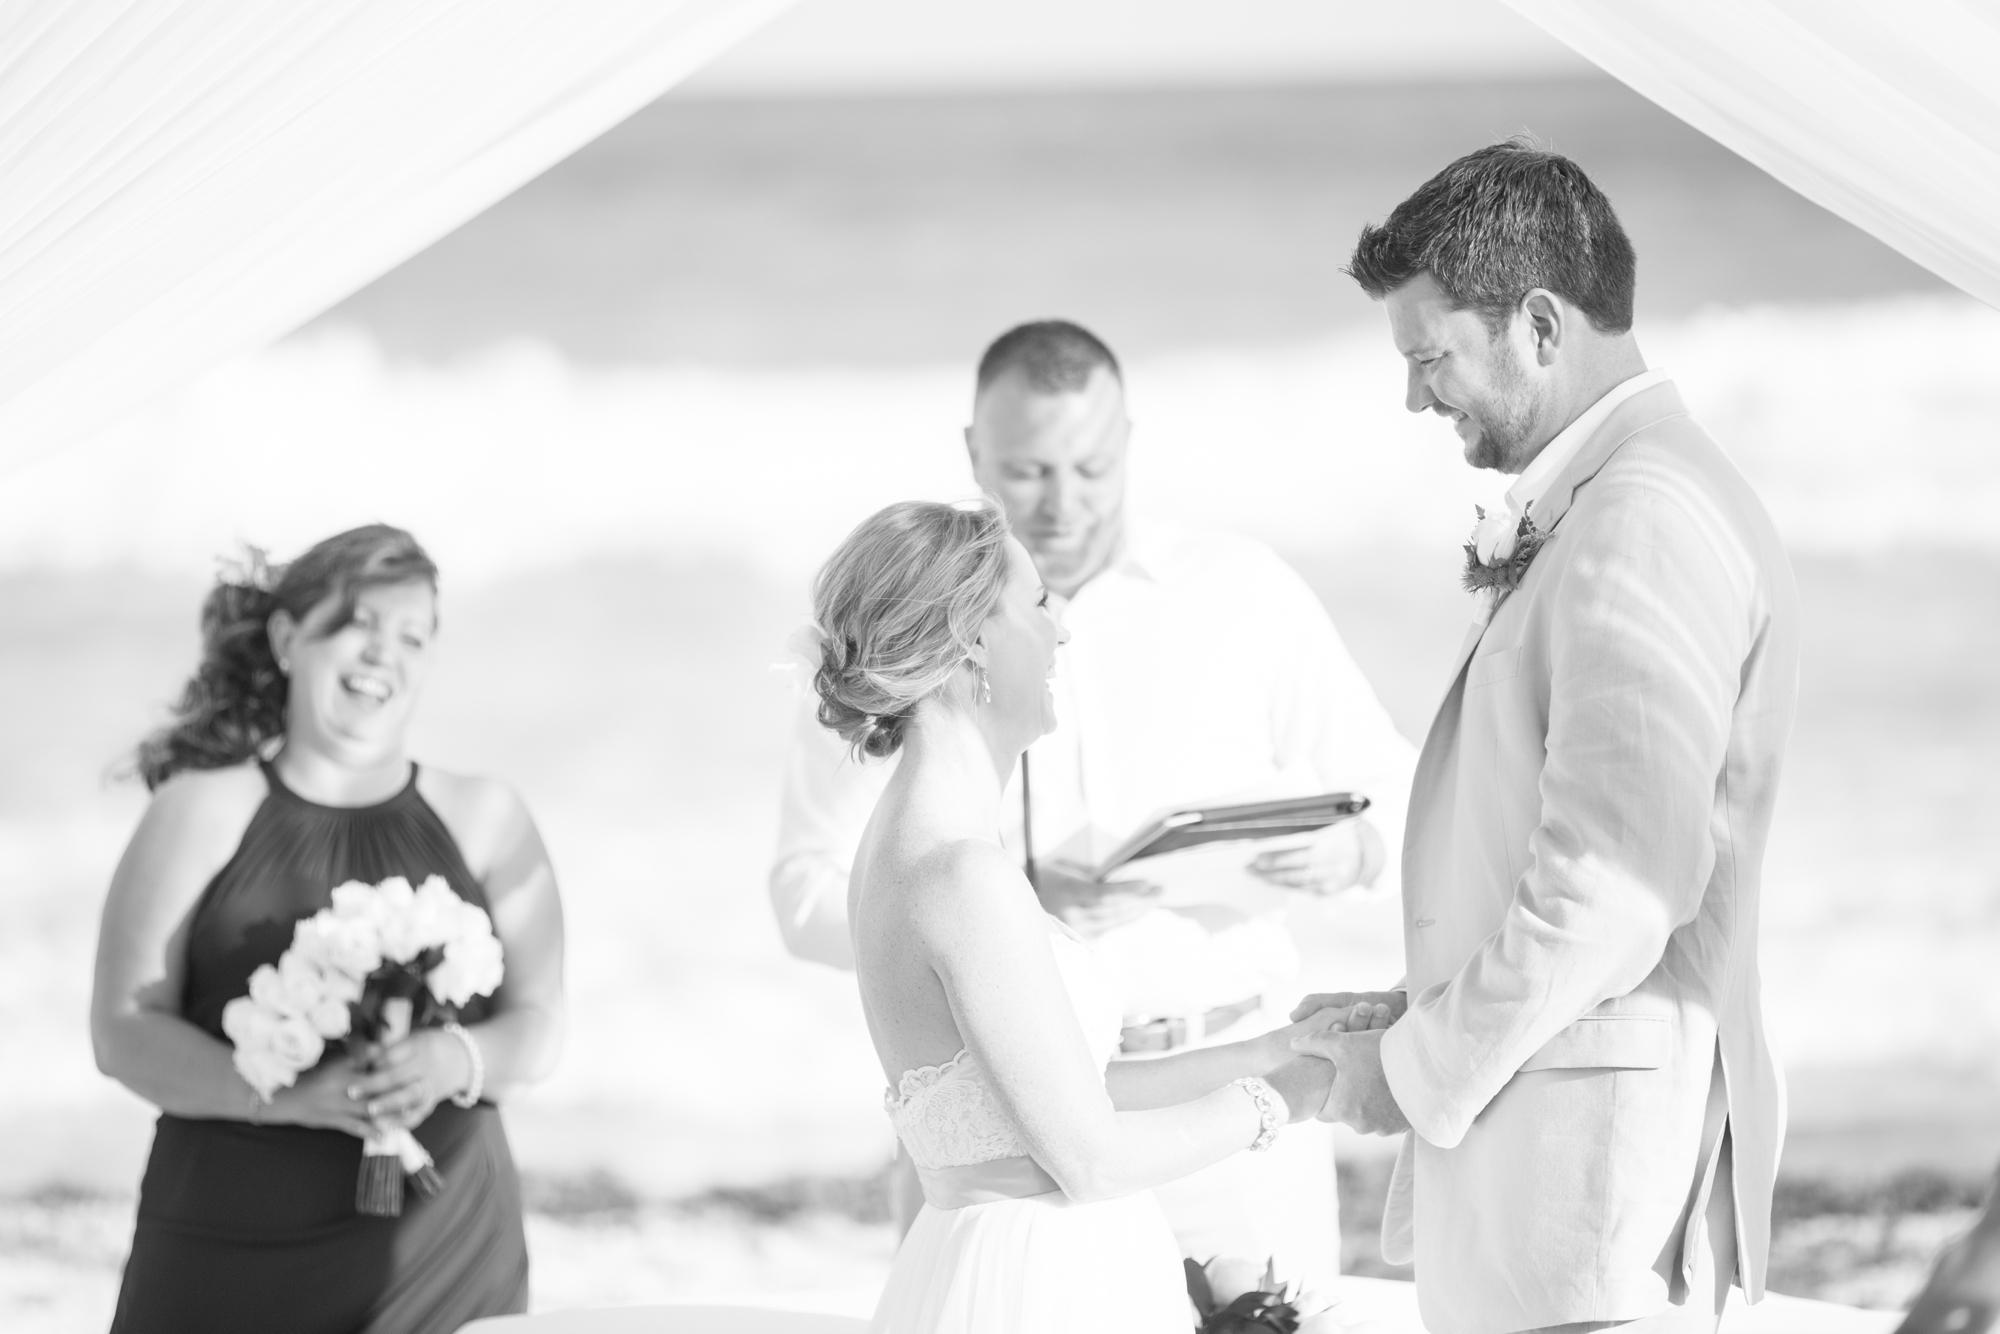 Morosoff Wedding 2-Ceremony-220_anna grace photography destination wedding photographer playa del carmen mexico photo.jpg